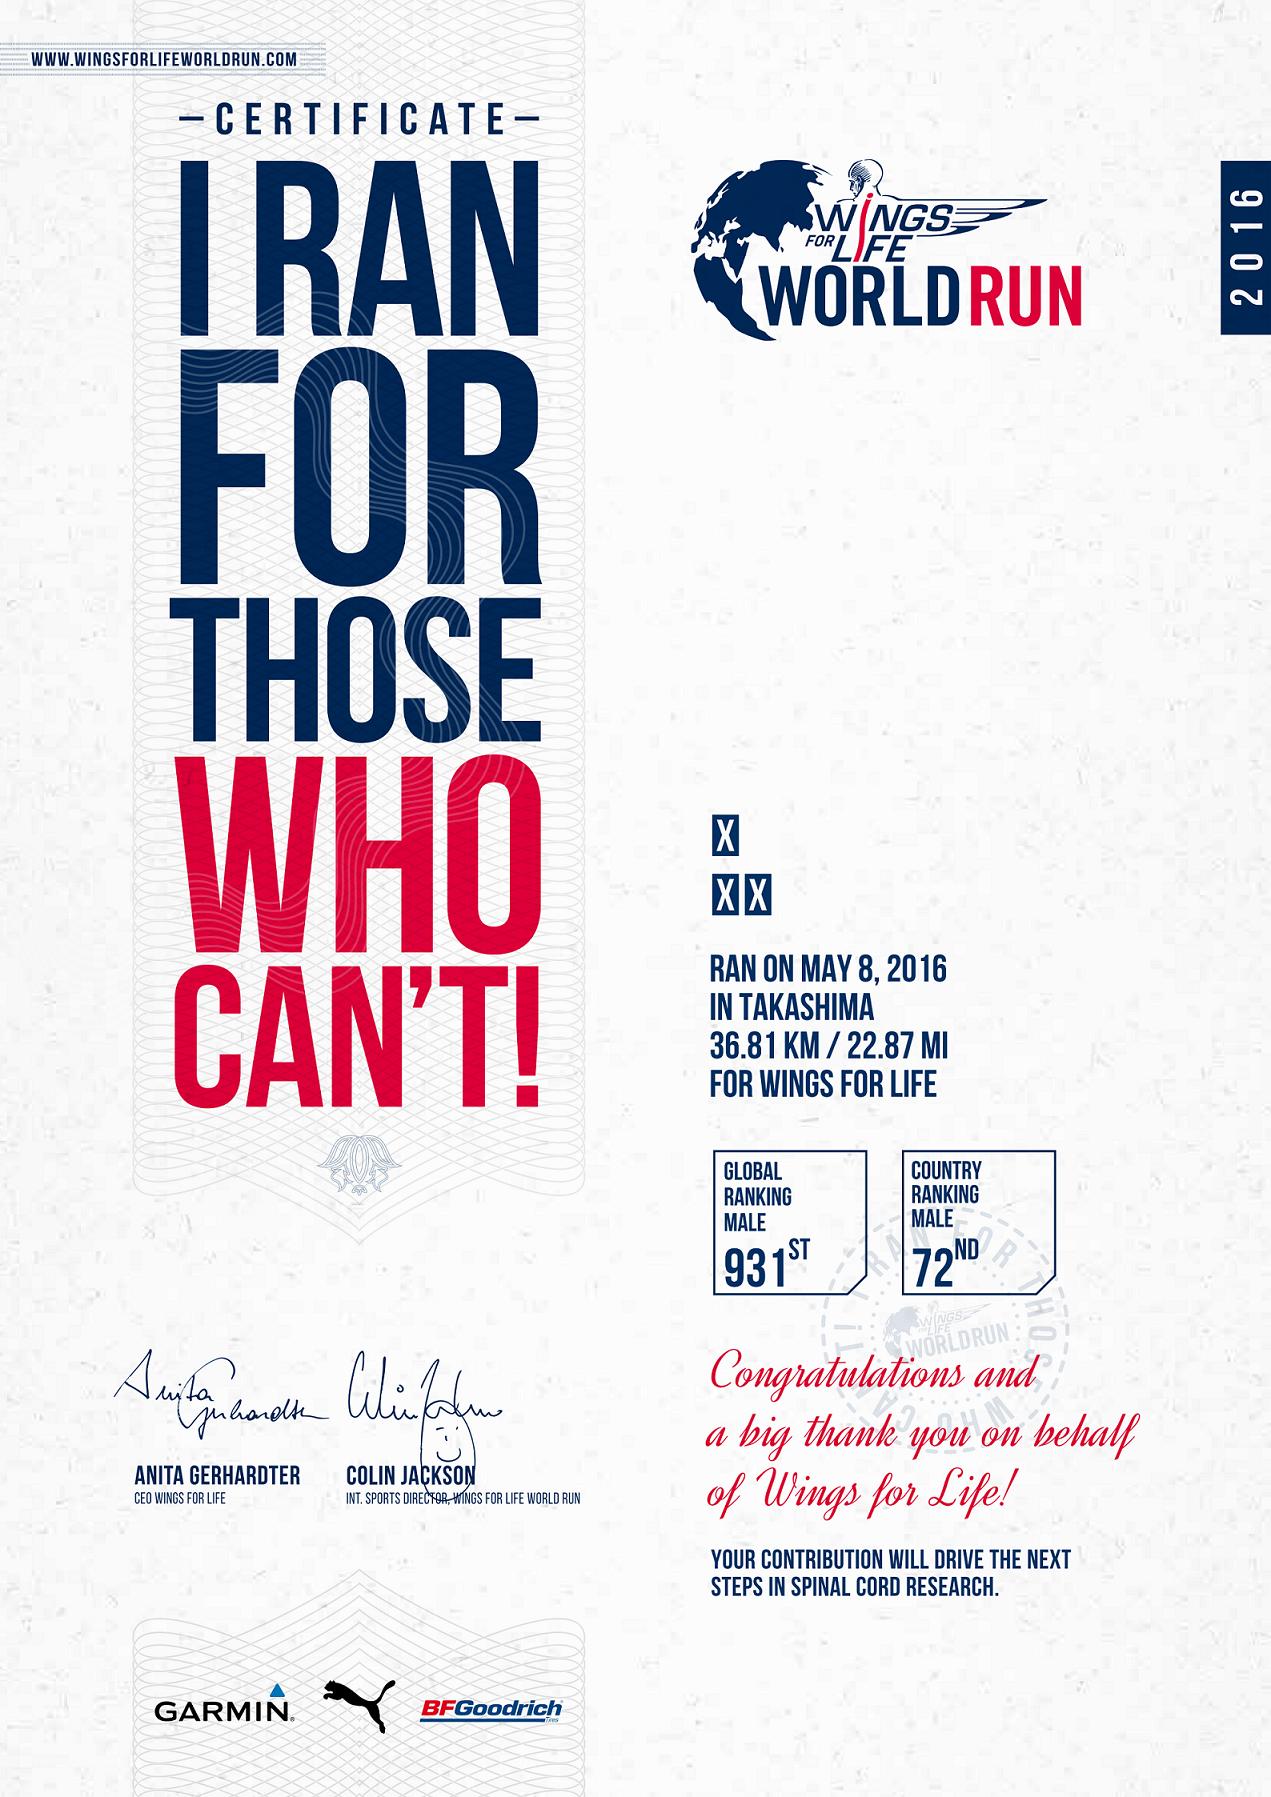 world run certificate_01